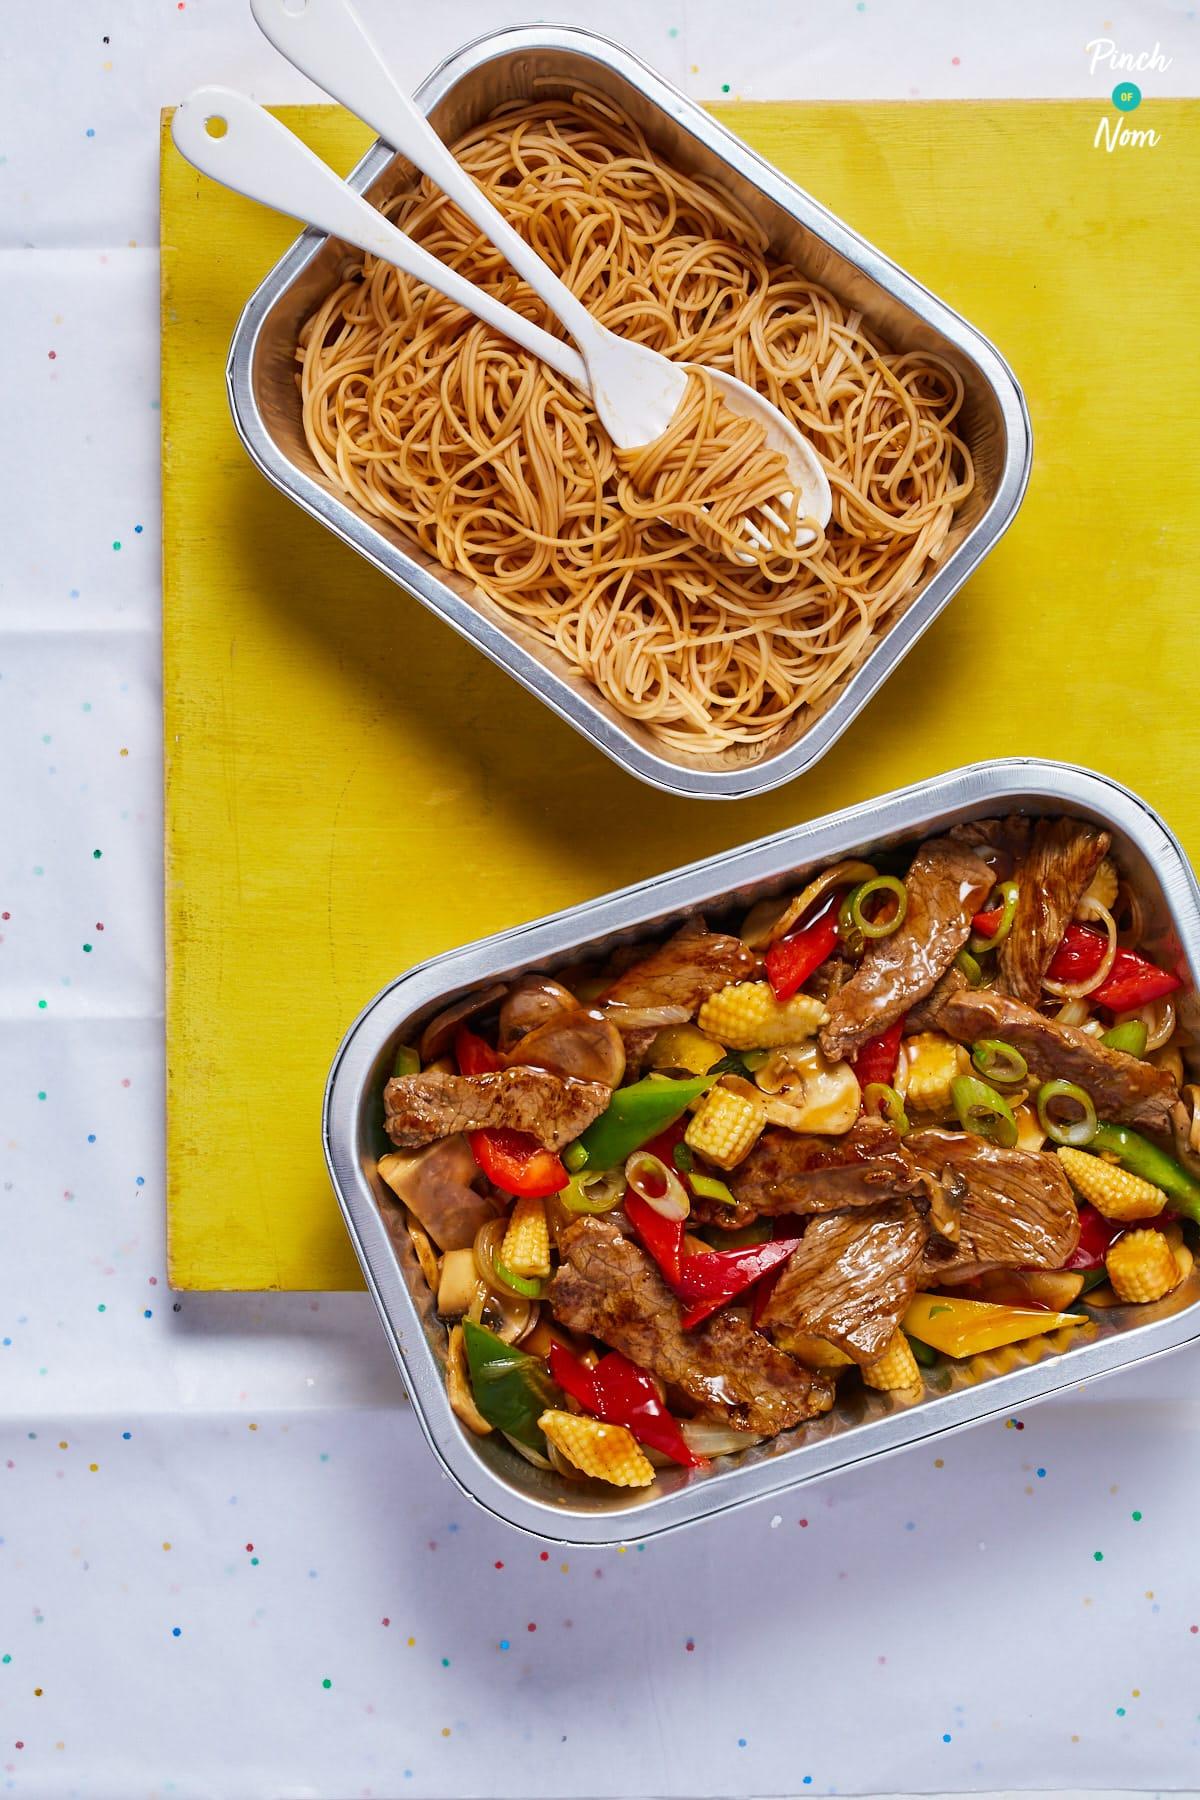 Stir Fry Beef & Ginger-2 - Pinch of Nom Slimming Recipes